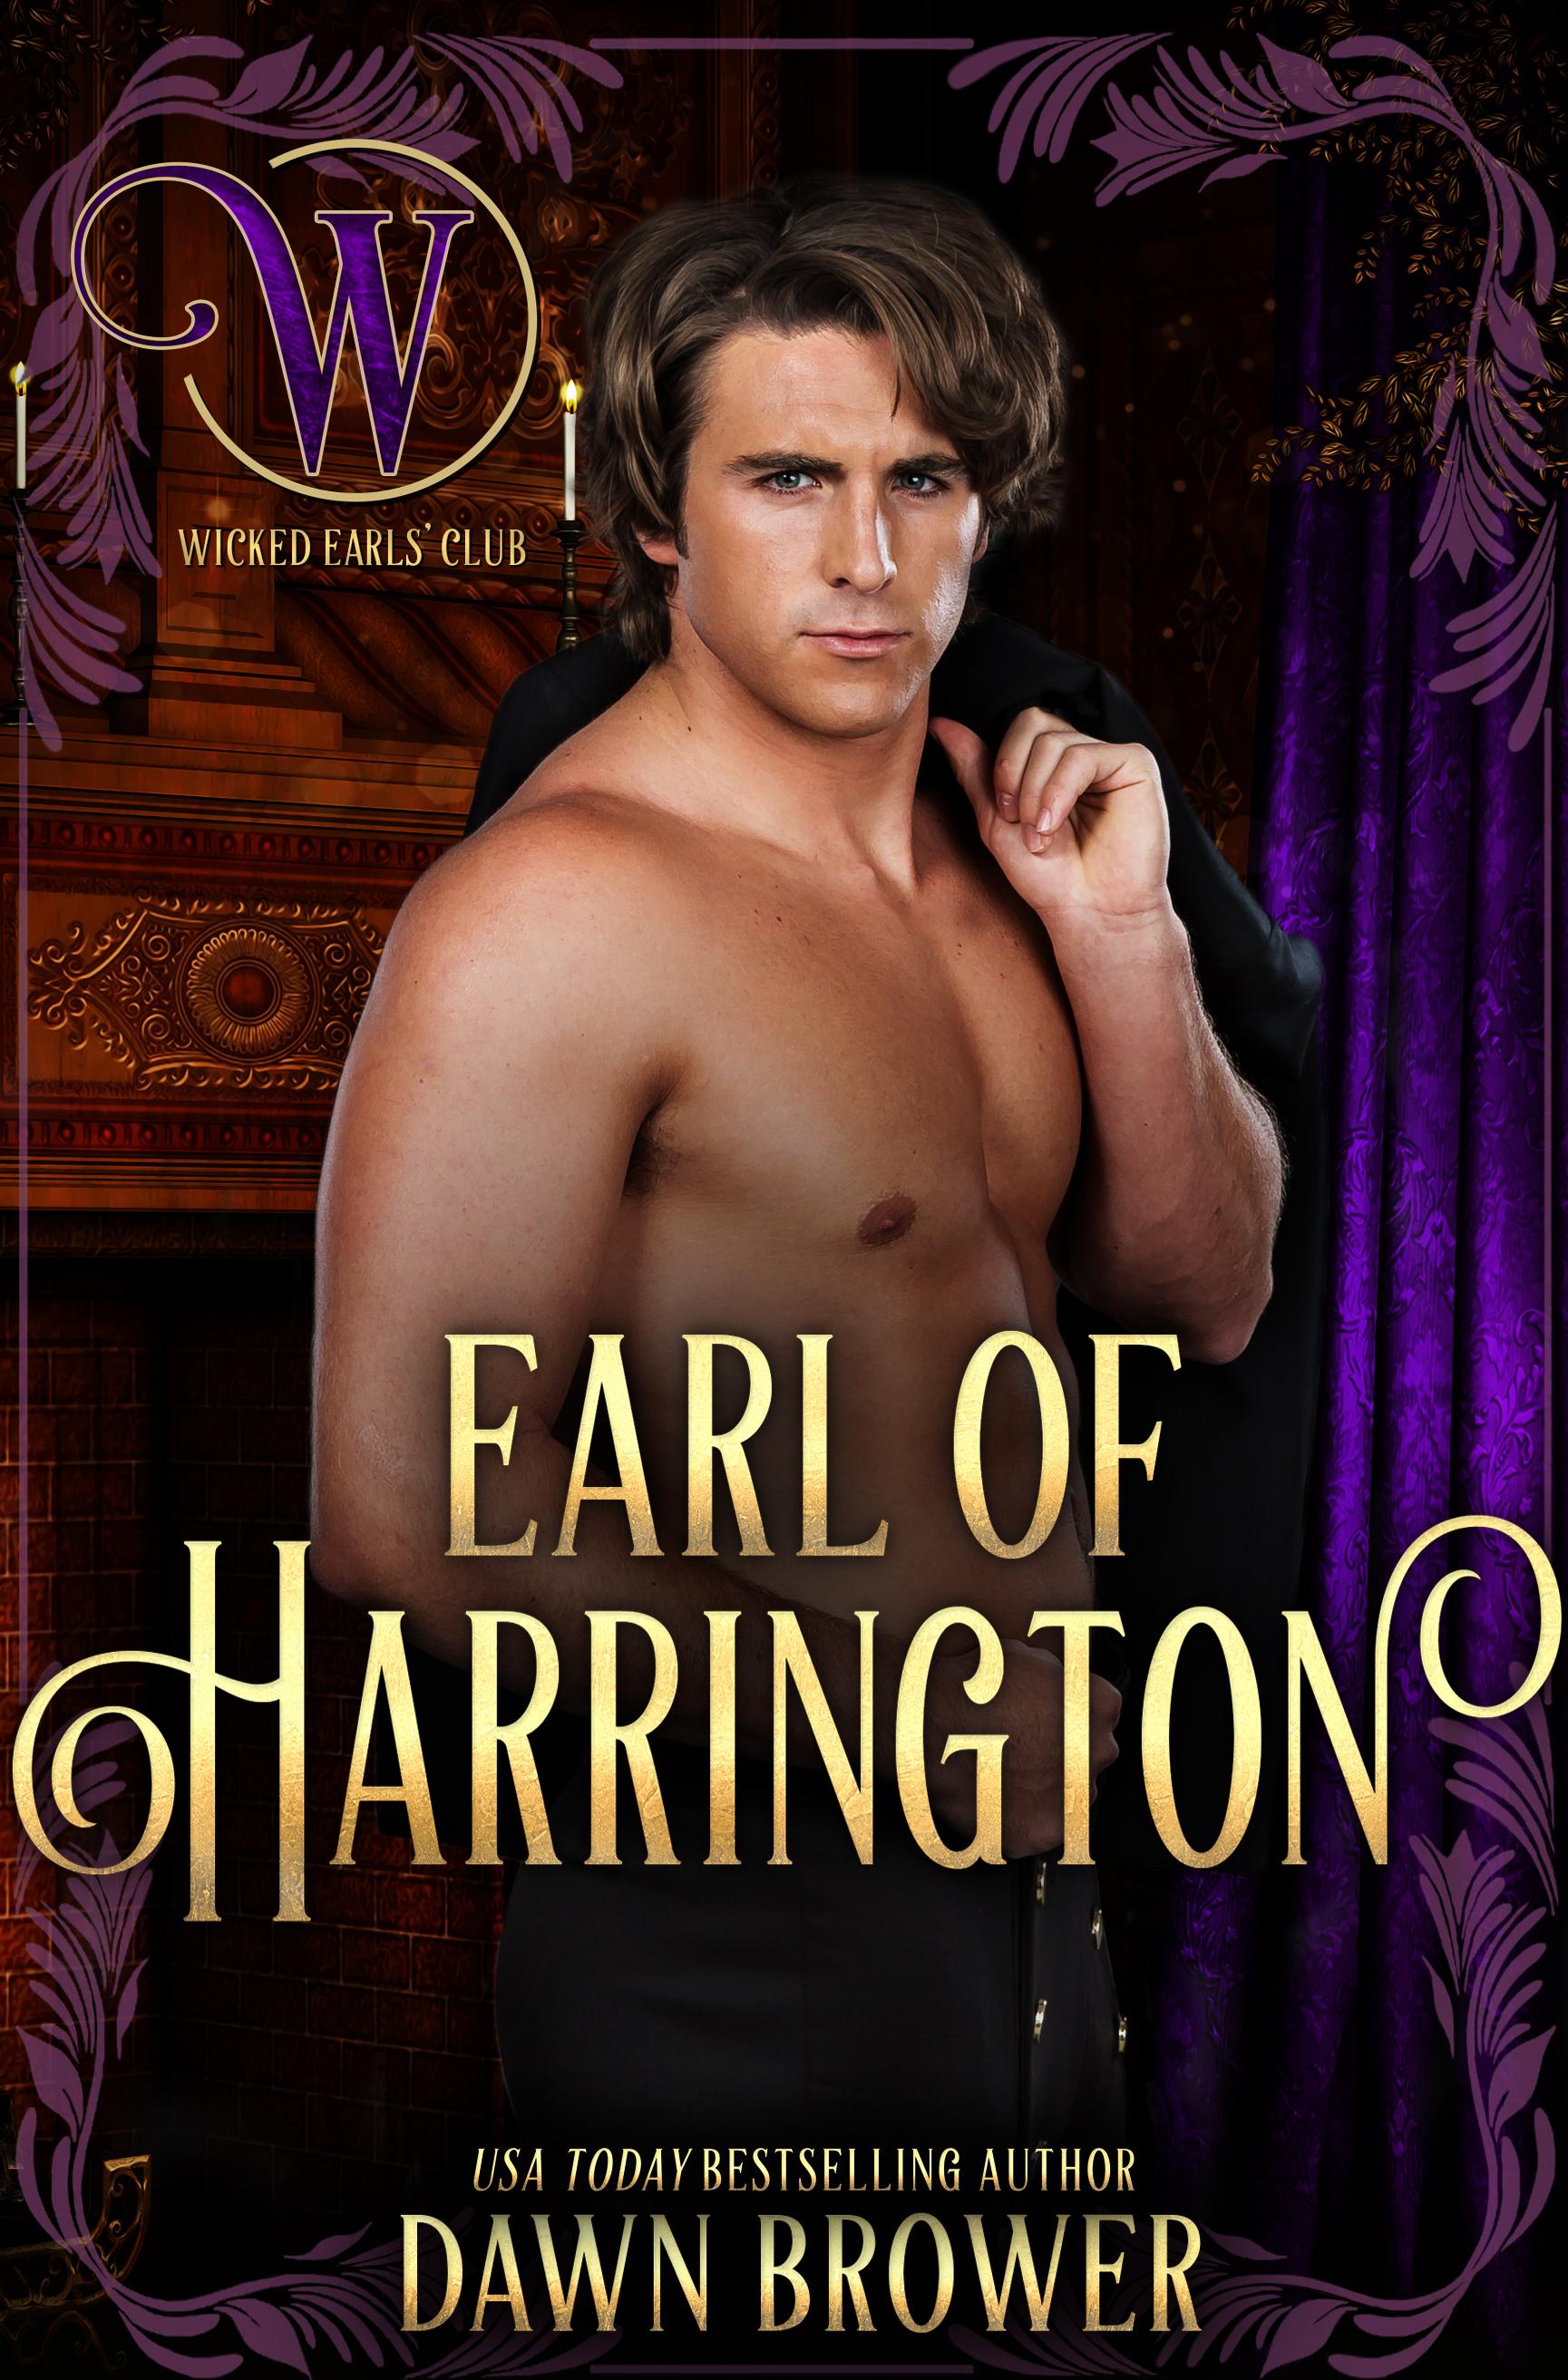 Earl of harrington